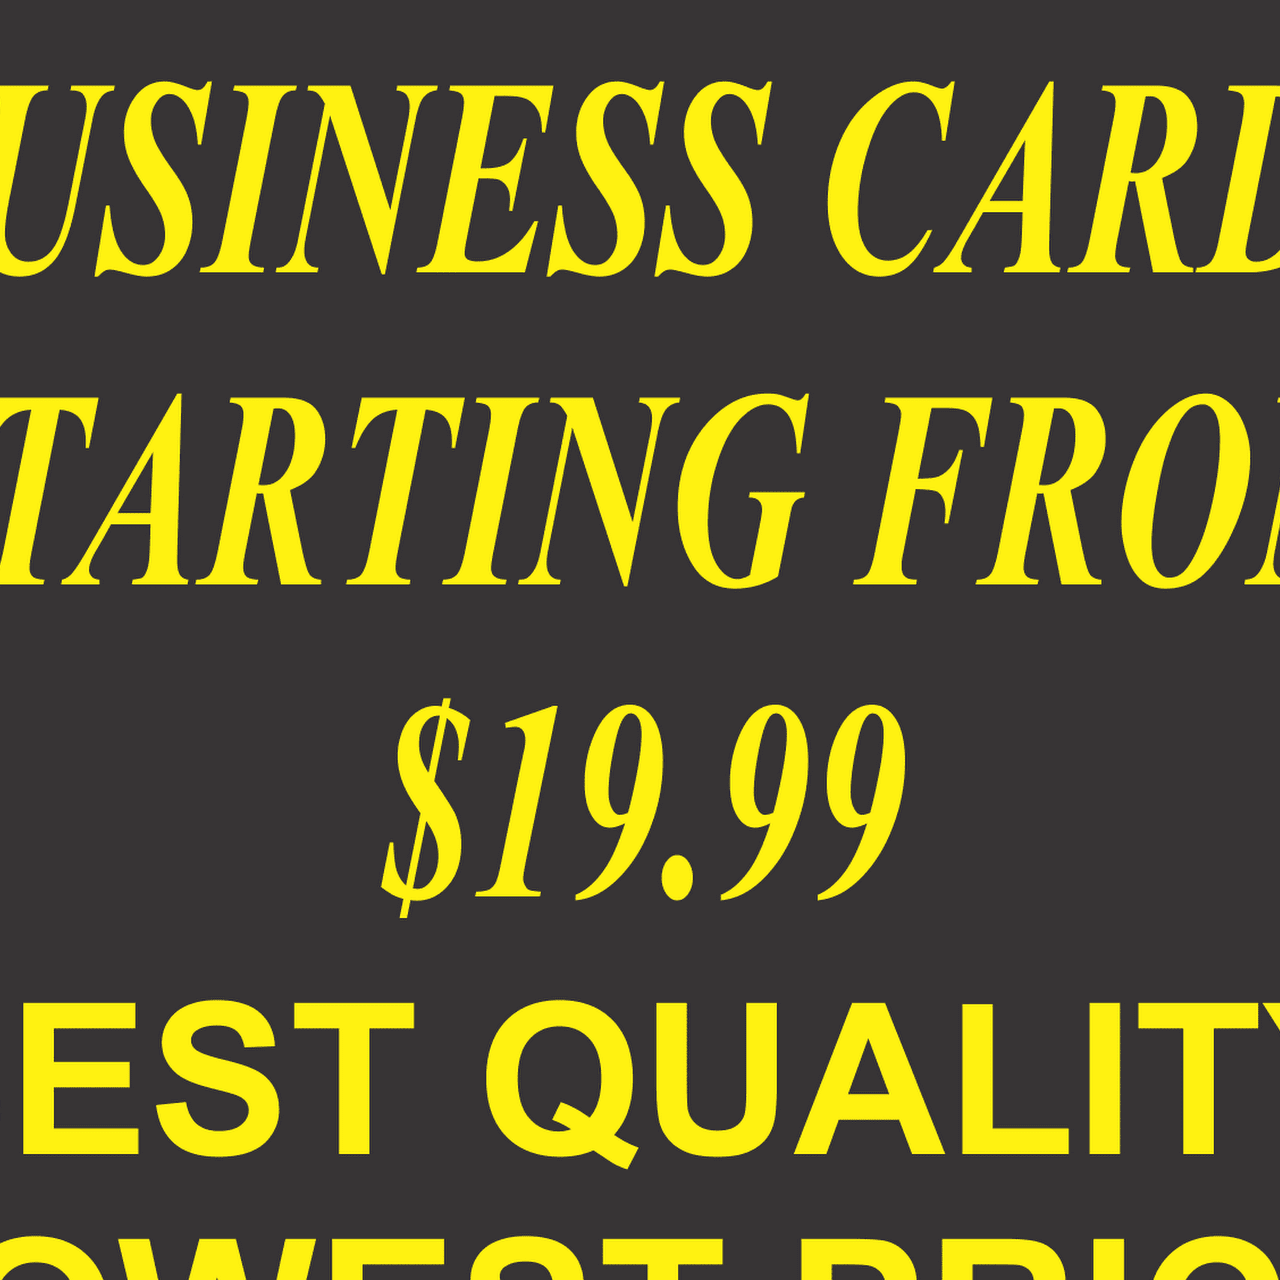 Focus Printing Calgary   Printing Services   Business Cards Printing ...